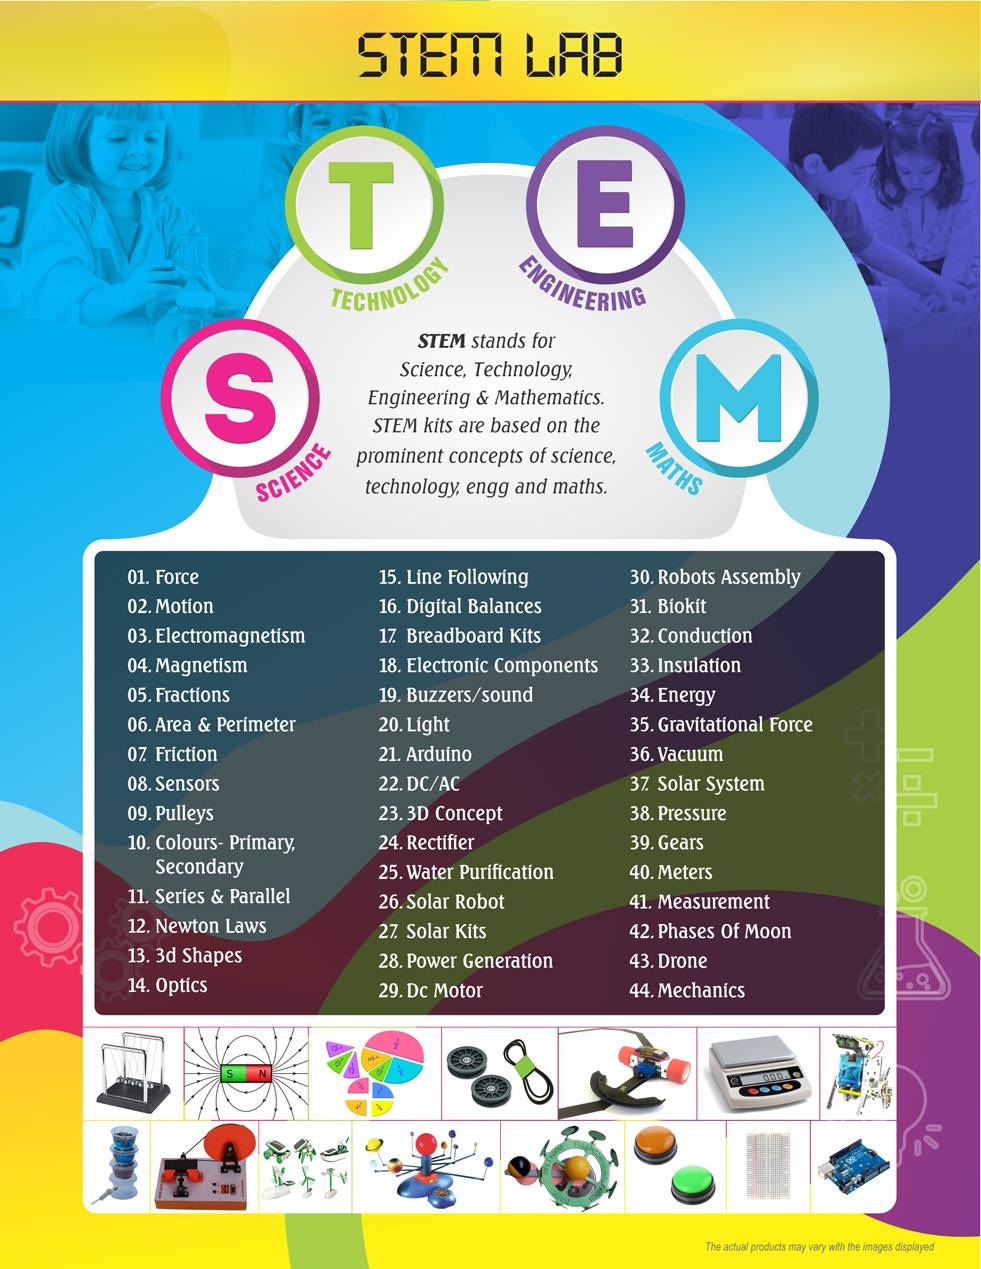 Stem Lab (Science, Technology,  Engineering & Mathematics)